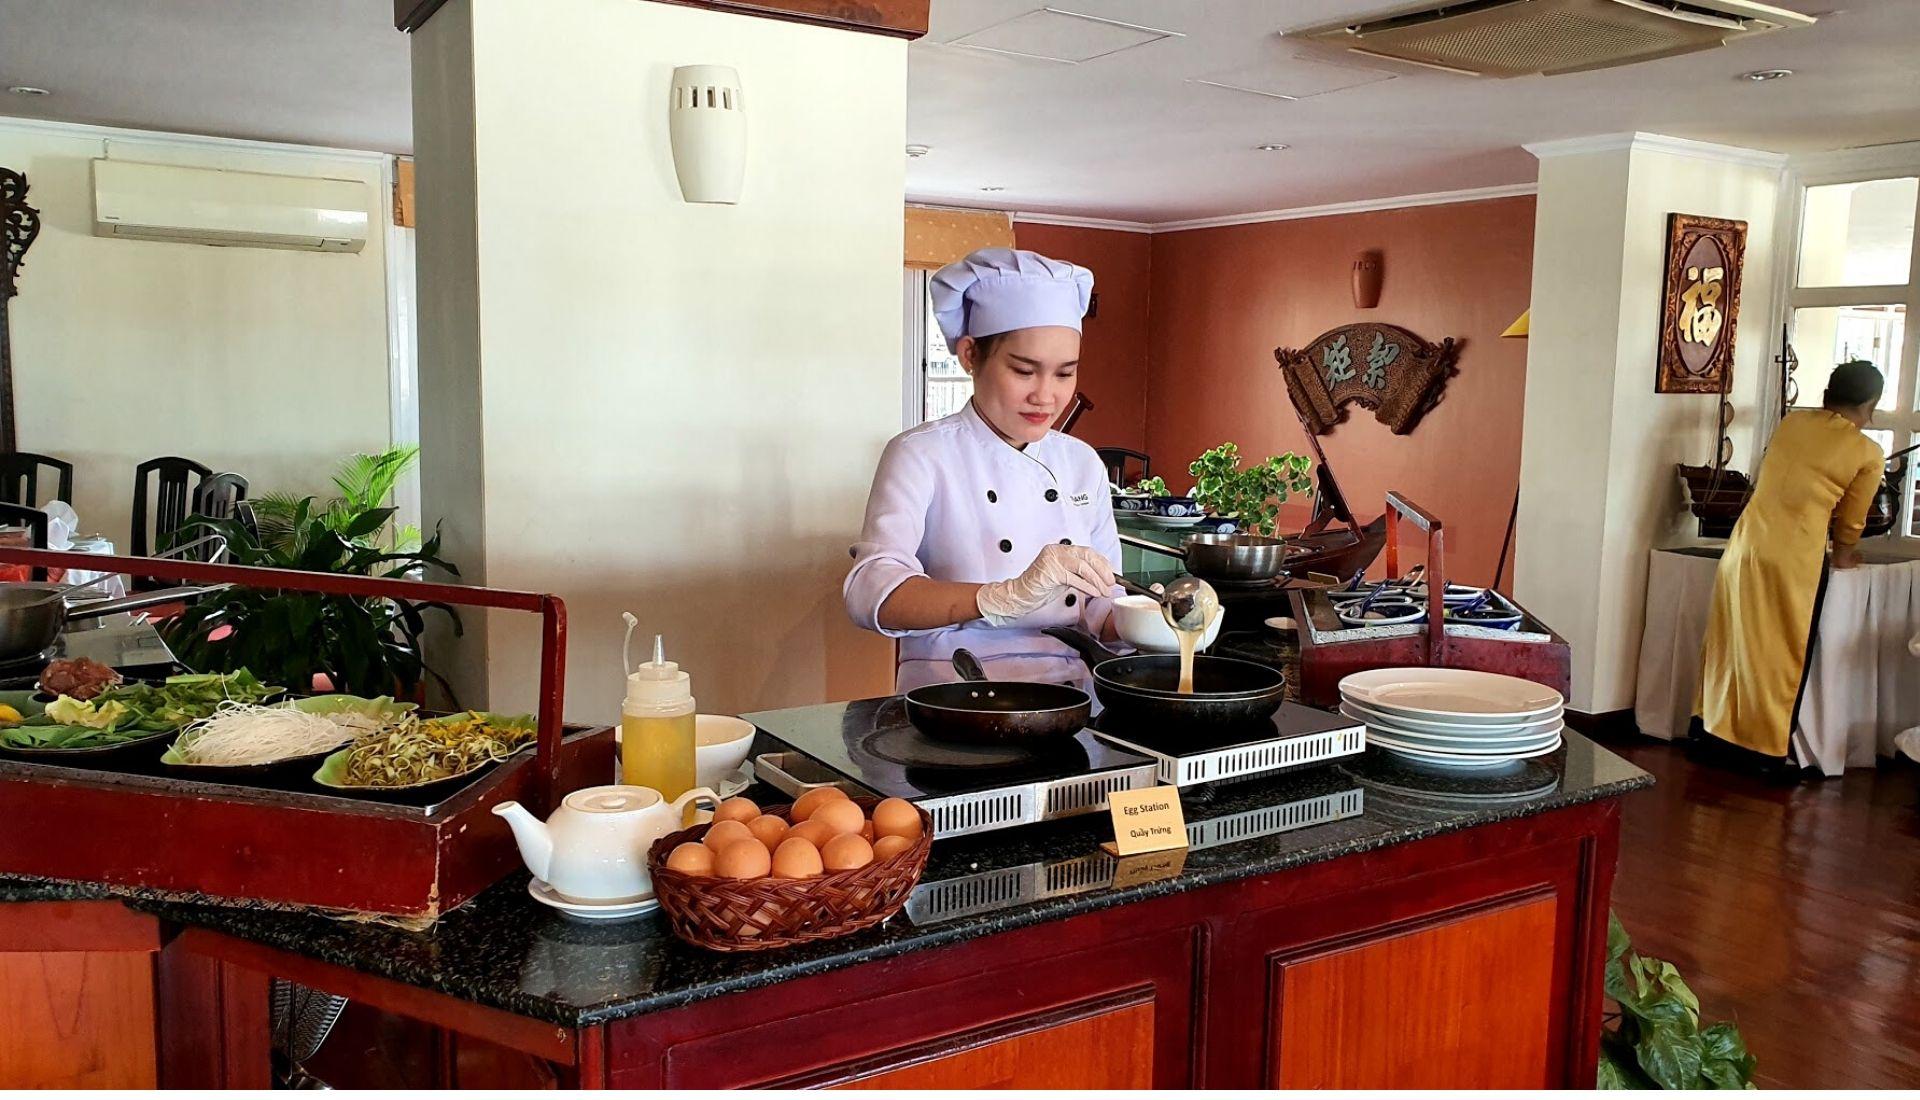 Bassac Restaurant - Egg Station at Breakfast